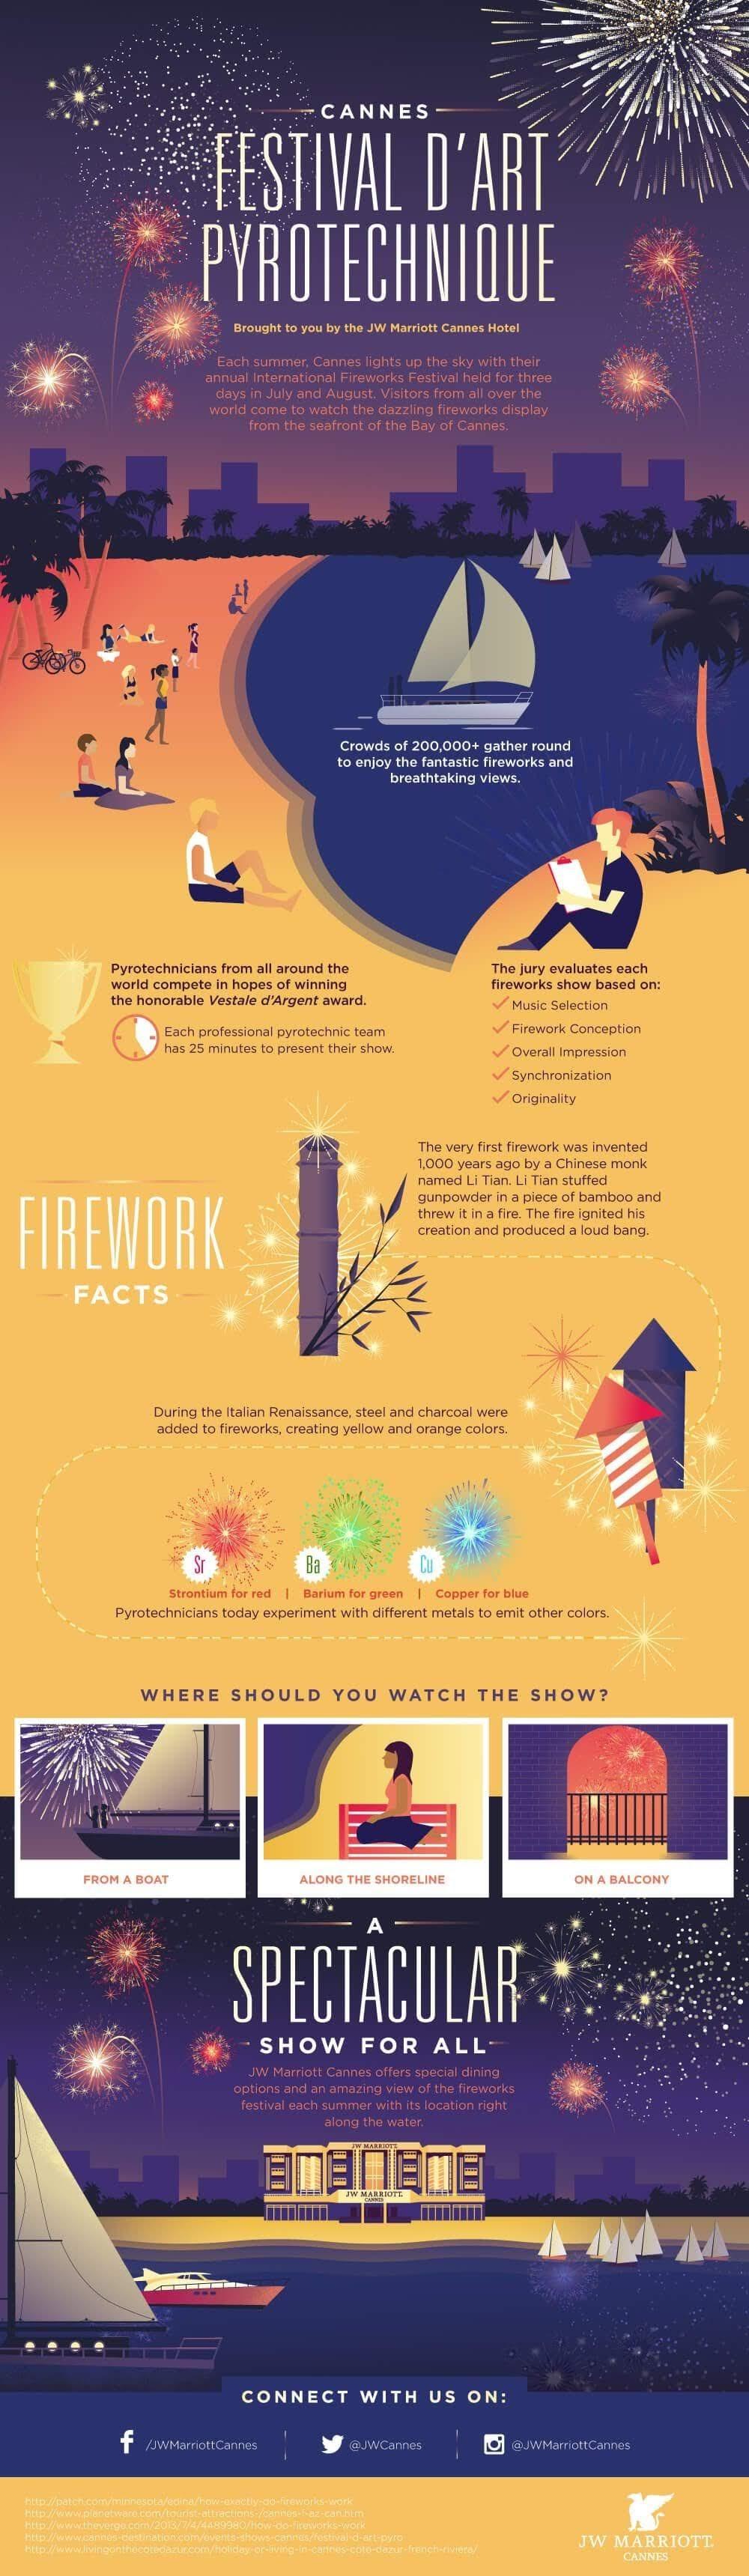 Festival D'art pyrotechnique cannes #infographic